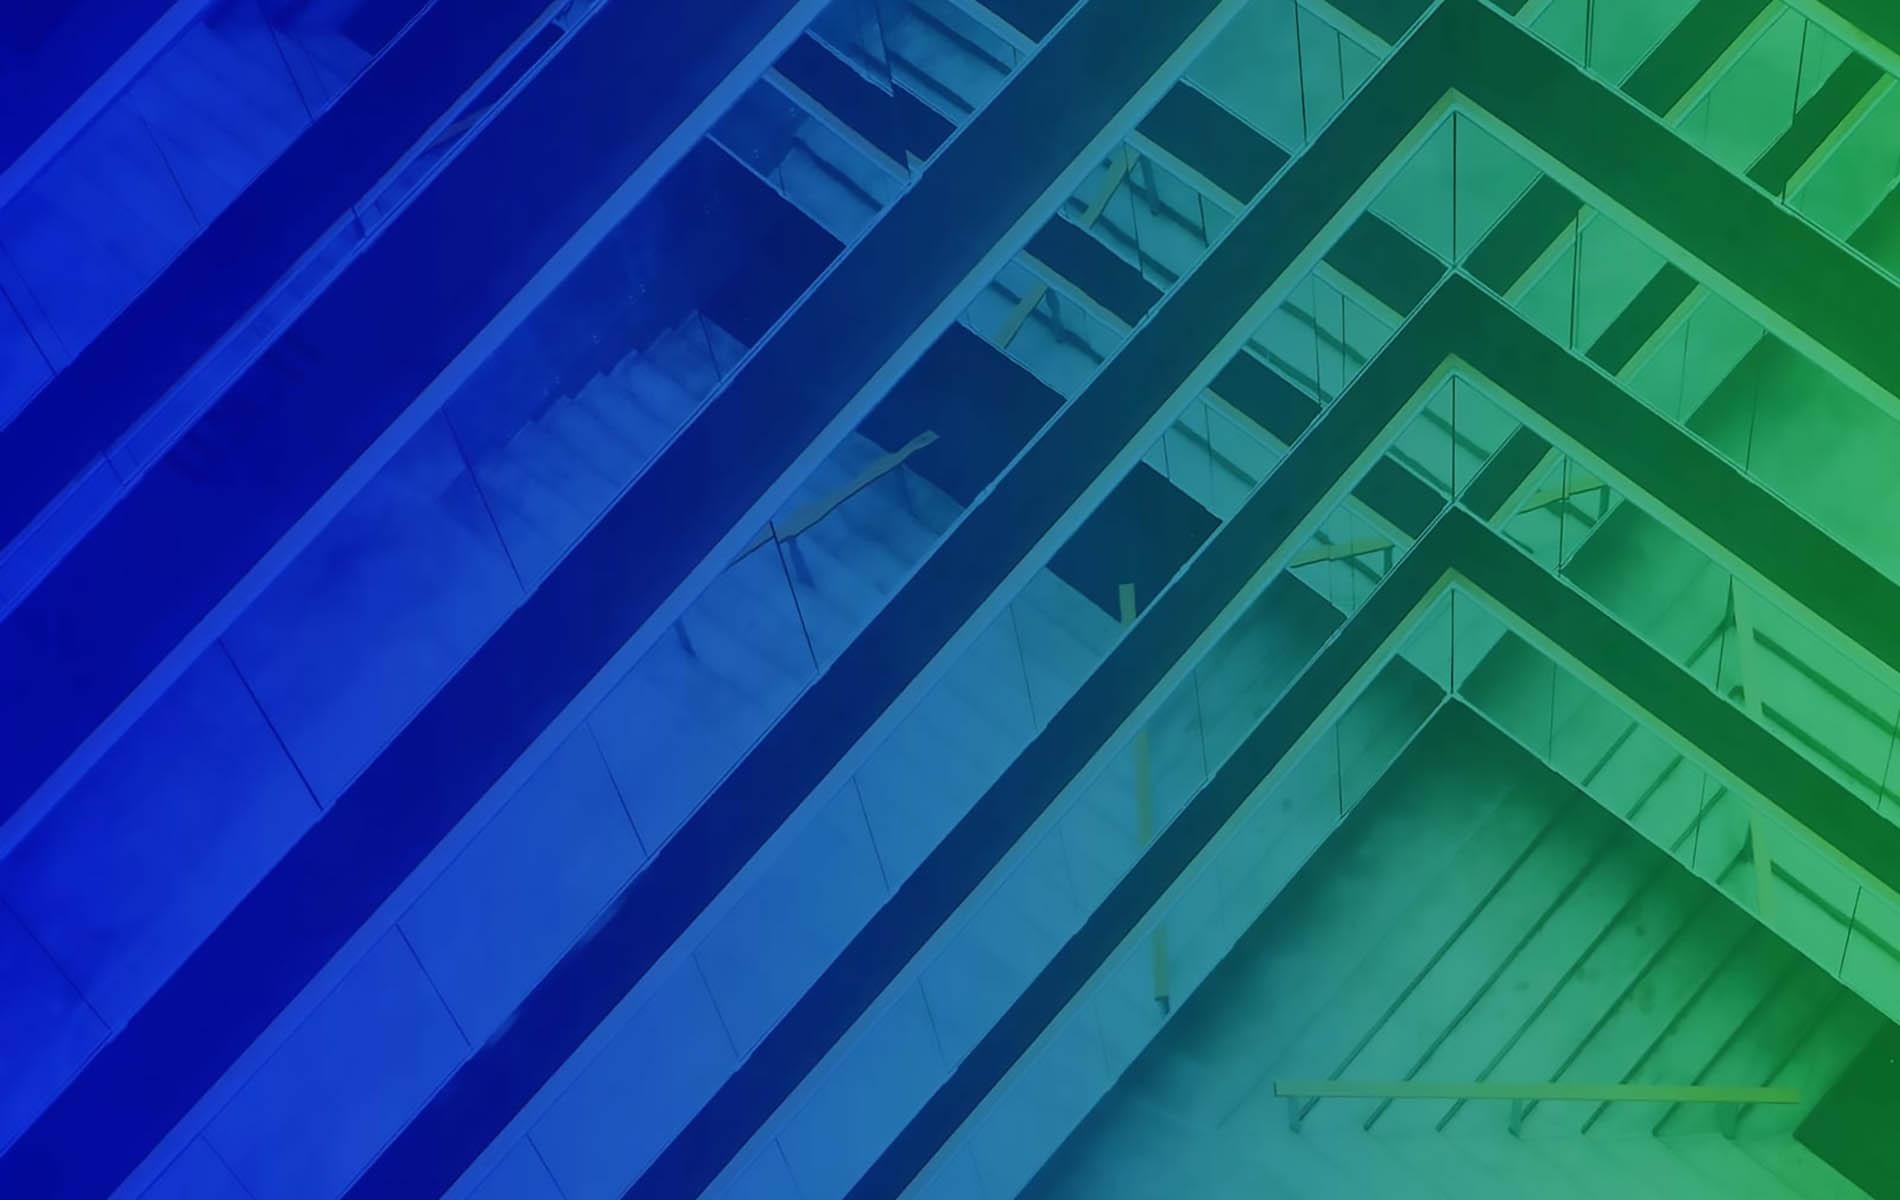 Decred Cryptocurrency Platform Releases Upgrade